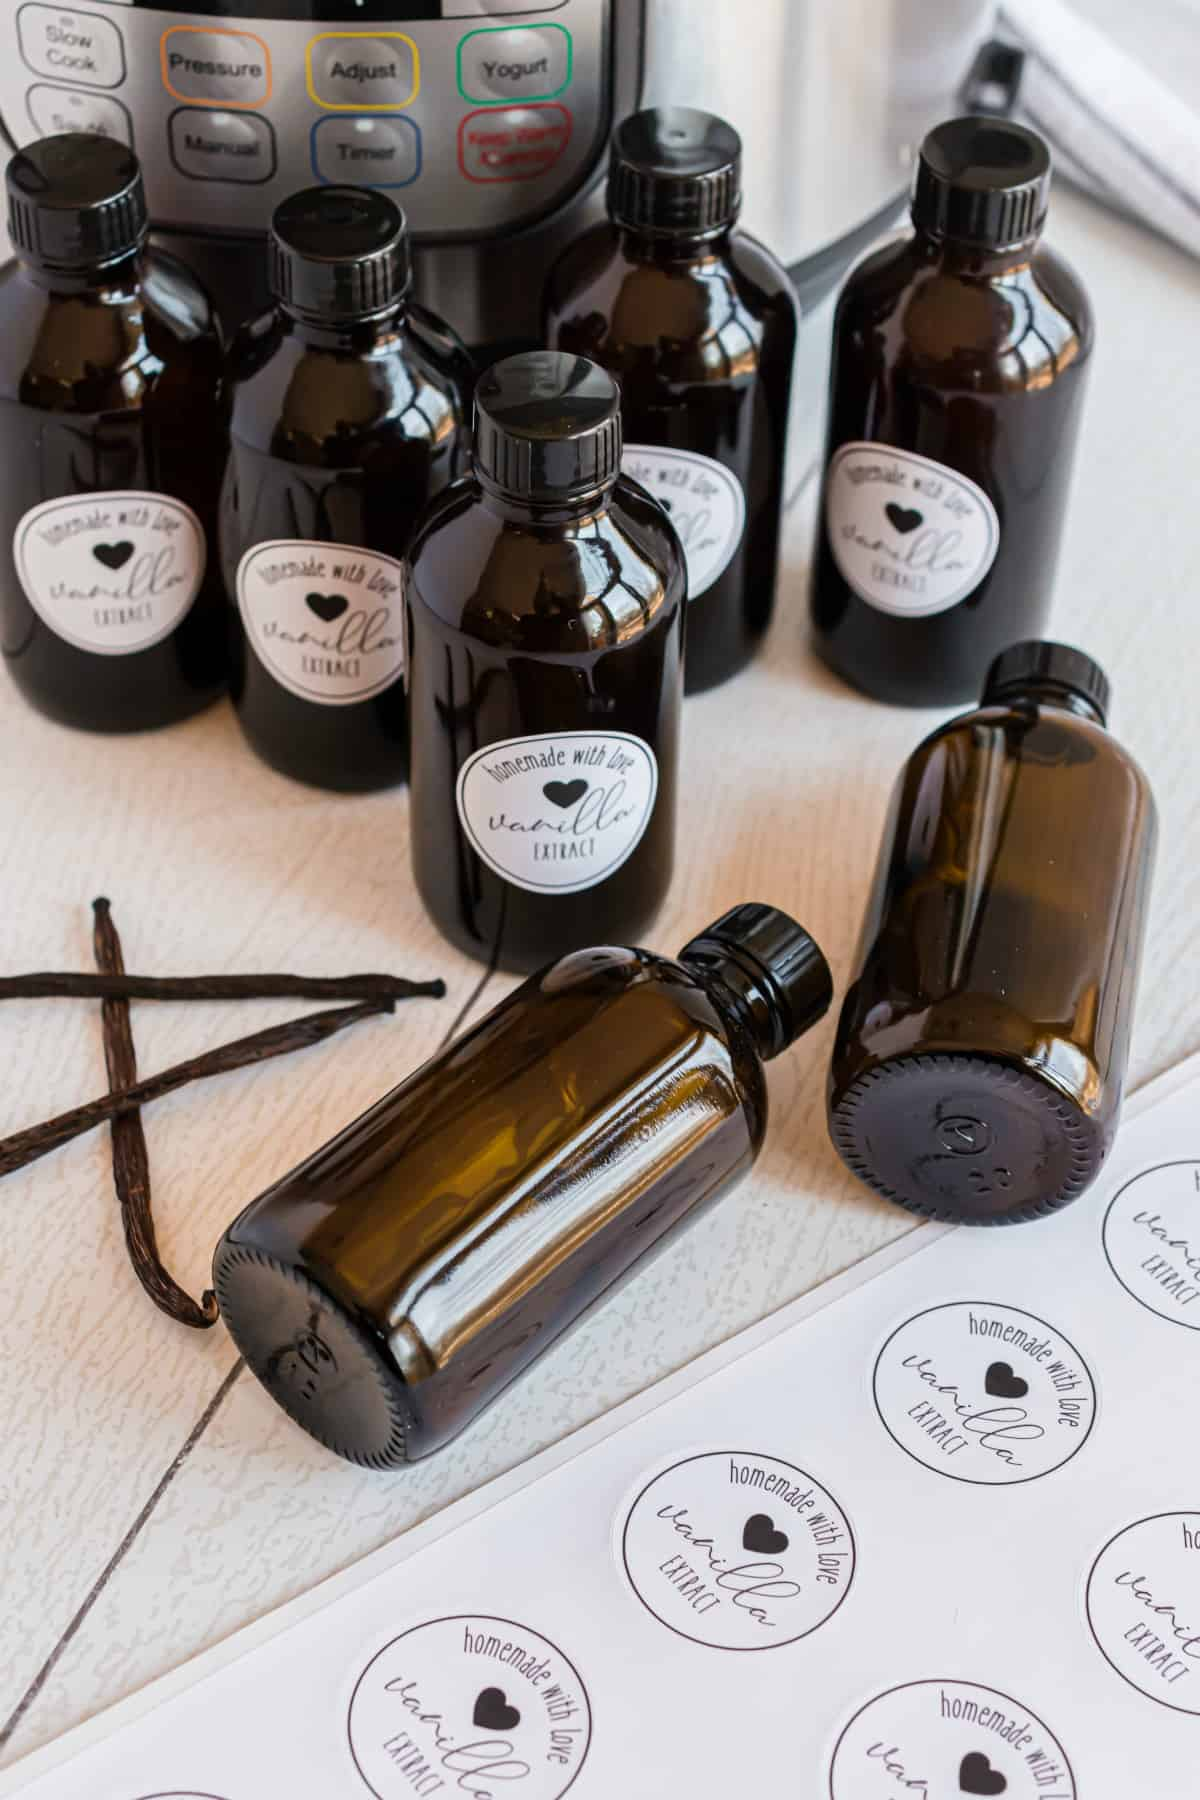 Supplies needed to make homemade vanilla extract.